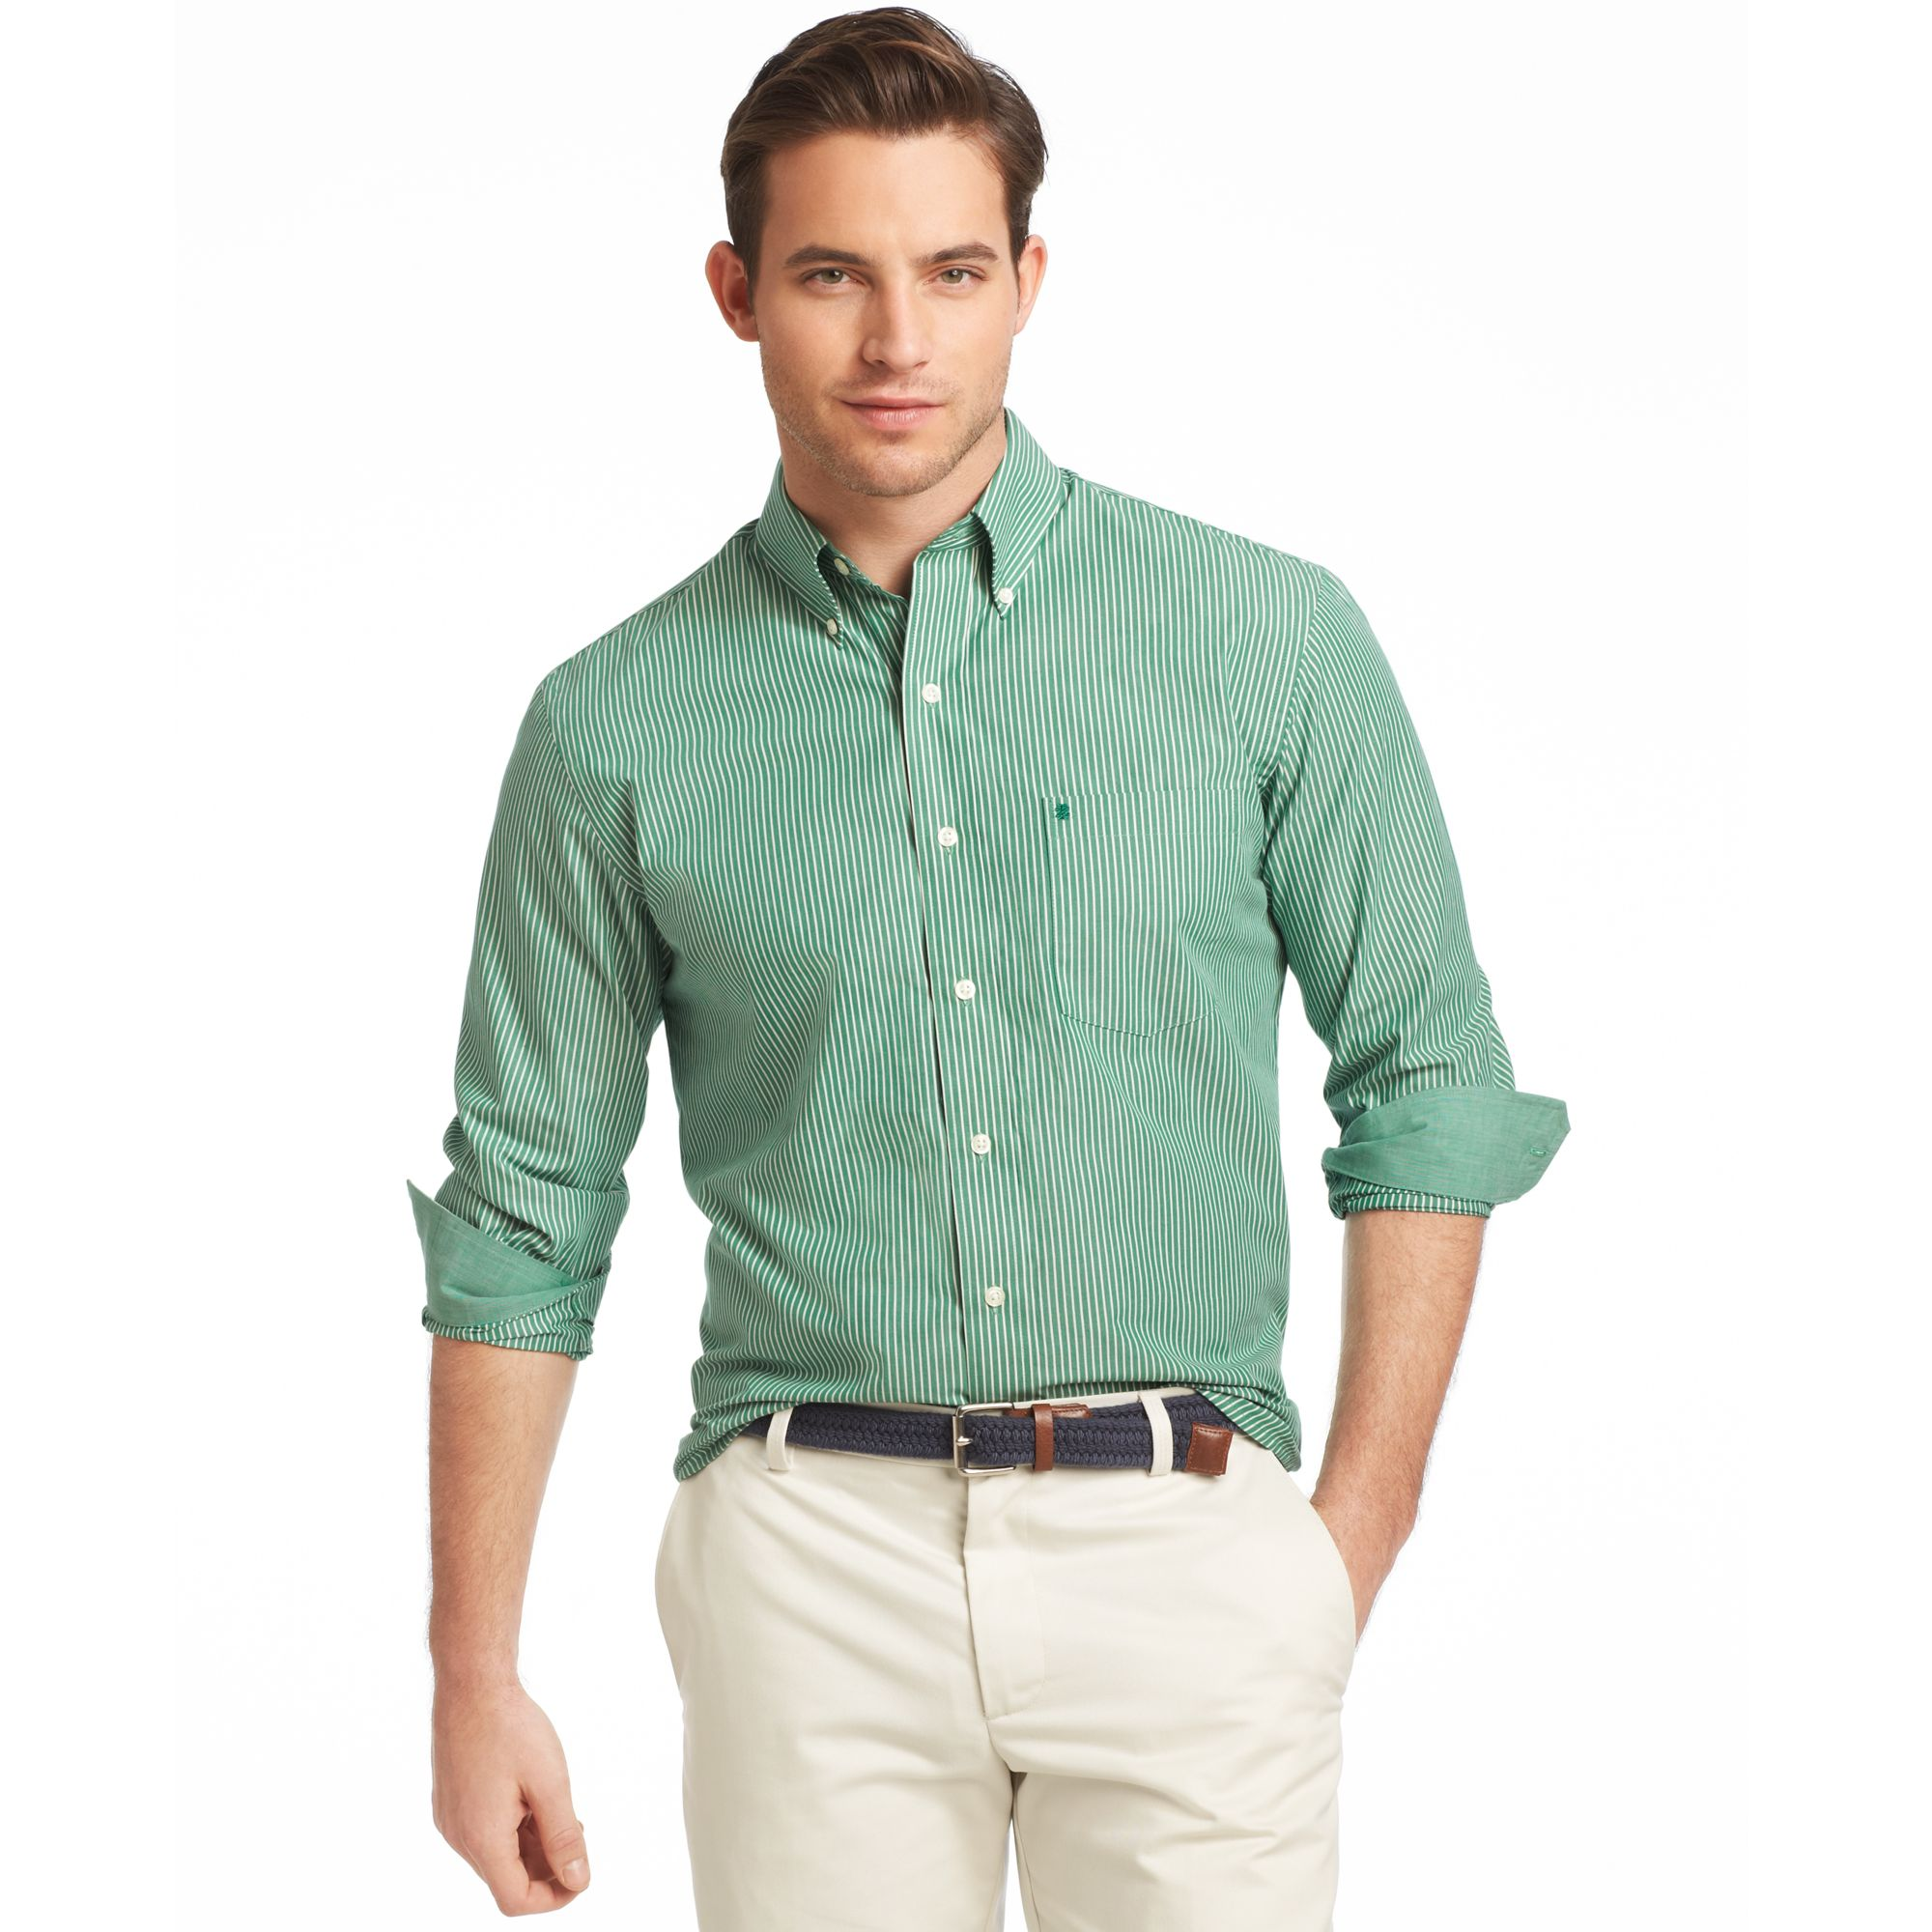 Lyst Izod Long Sleeve Essentials Striped Shirt In Green